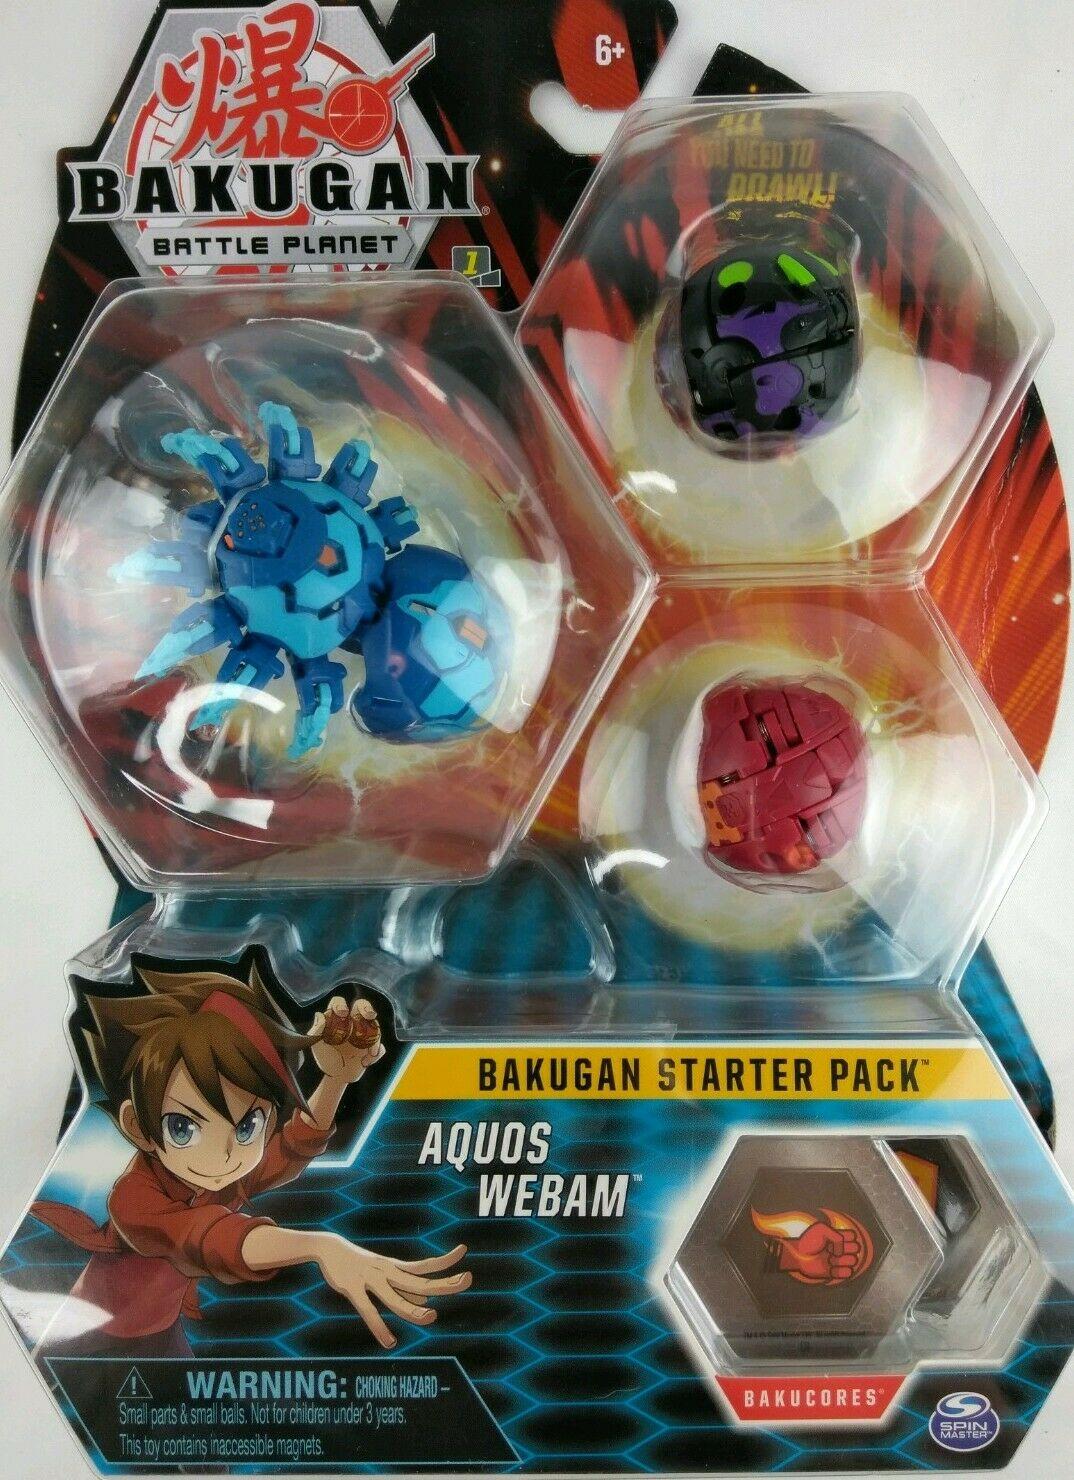 Bakugan Starter Pack Aquos Webam